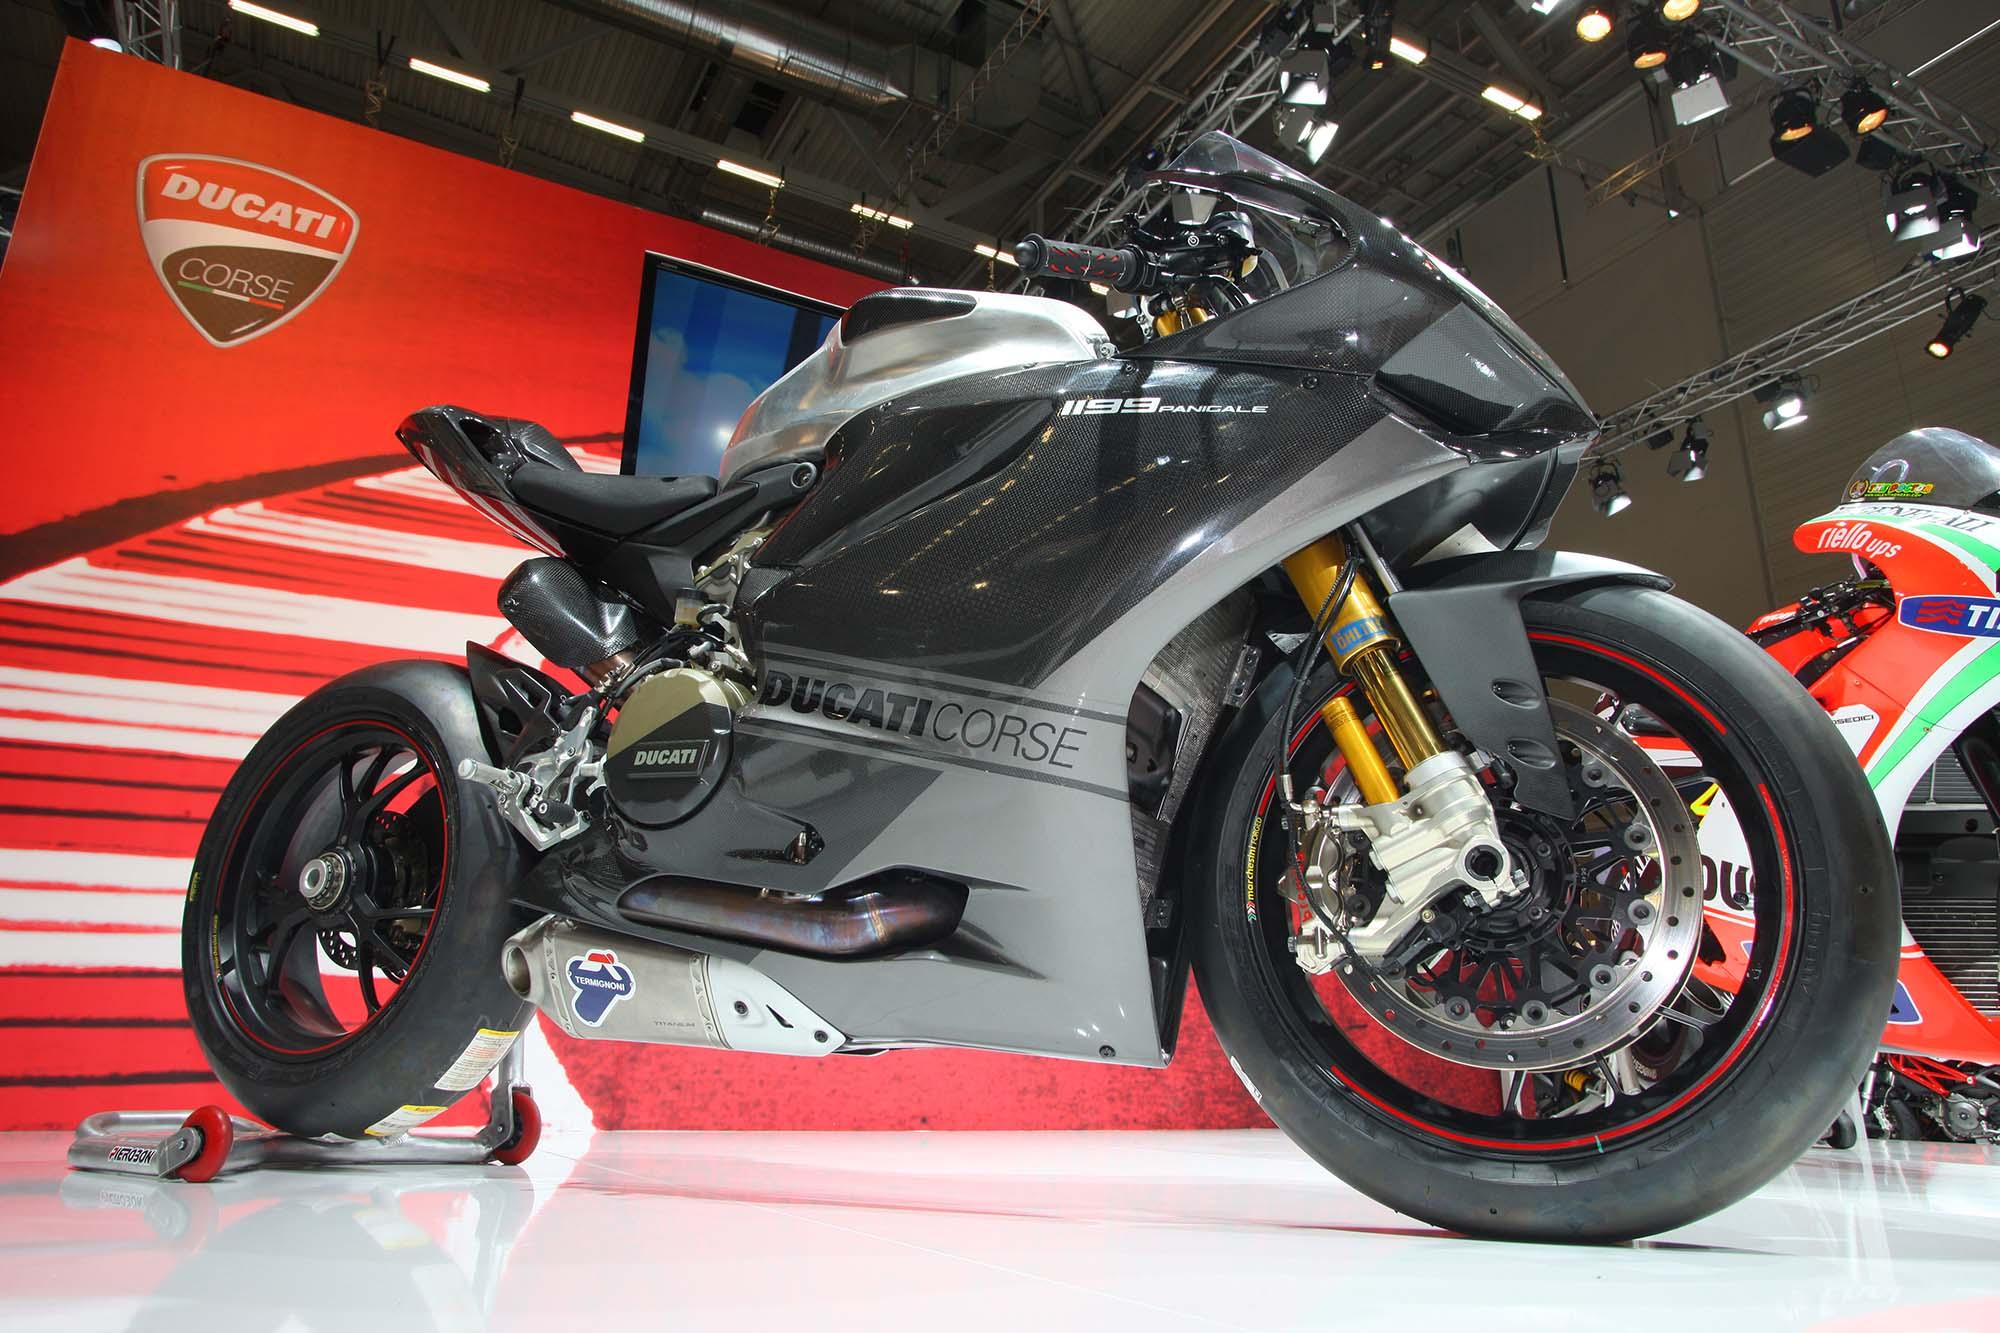 wsbk: althea racing and ducati corse part ways - asphalt & rubber